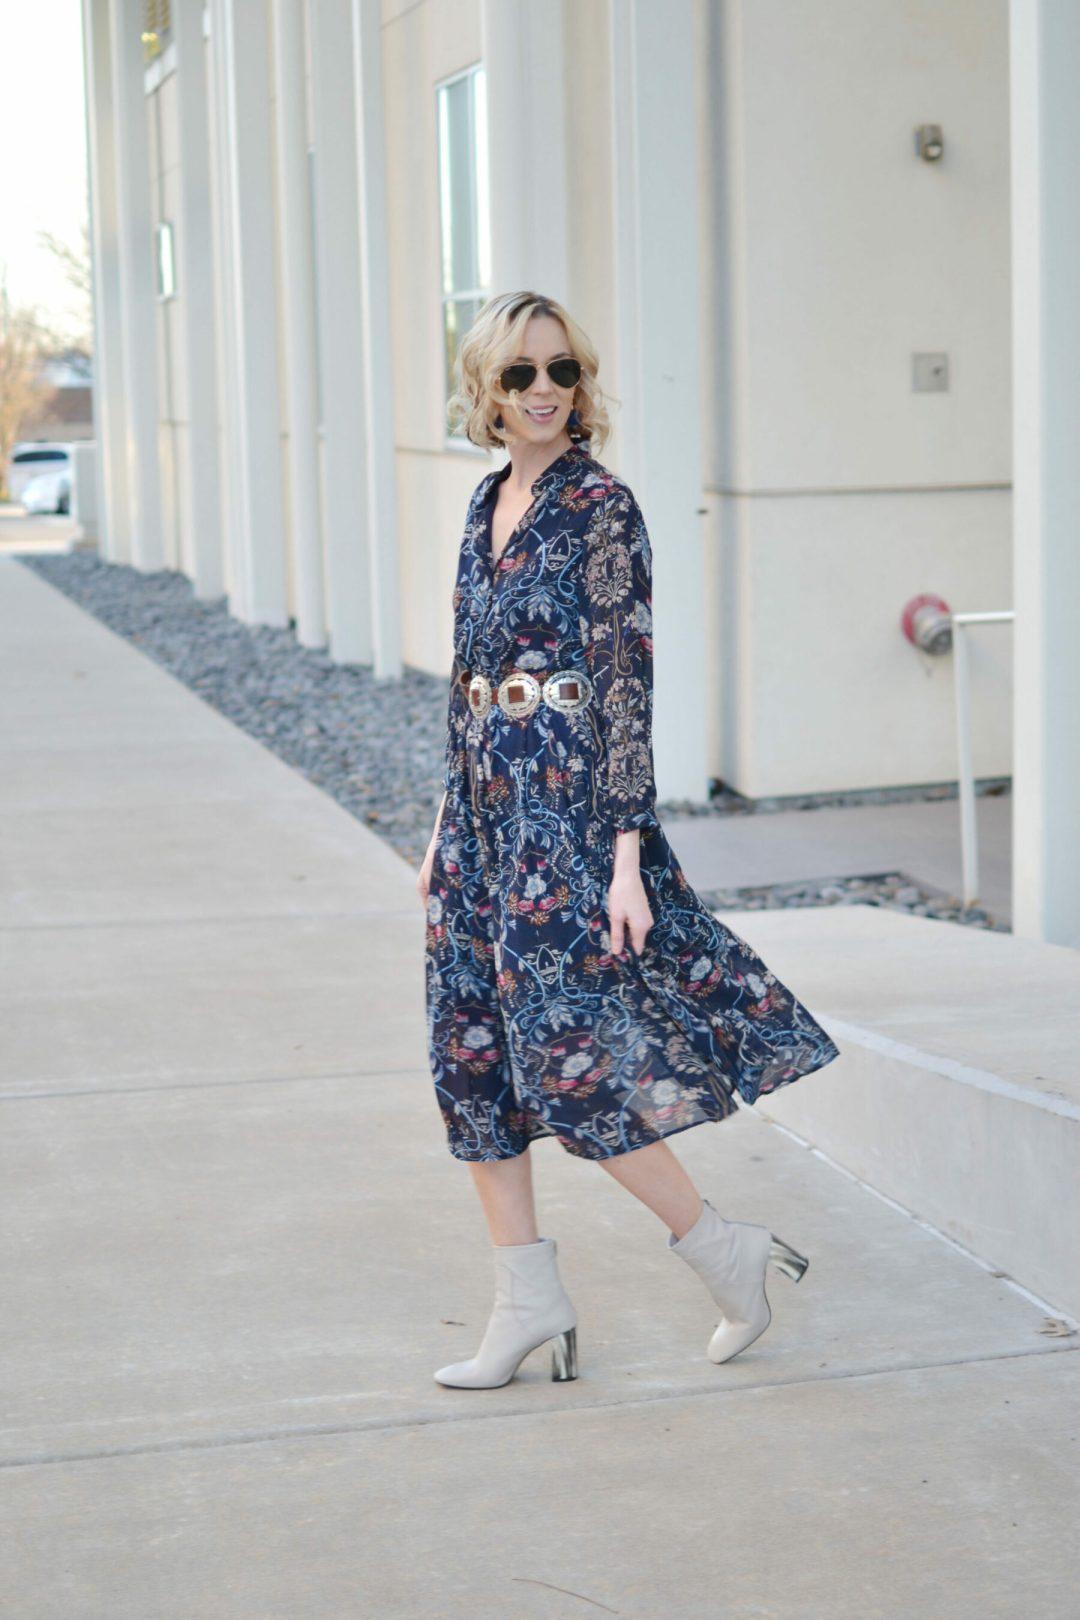 oasap floral midi dress, topshop mod cream boots, concho belt, ray-ban sunglasses